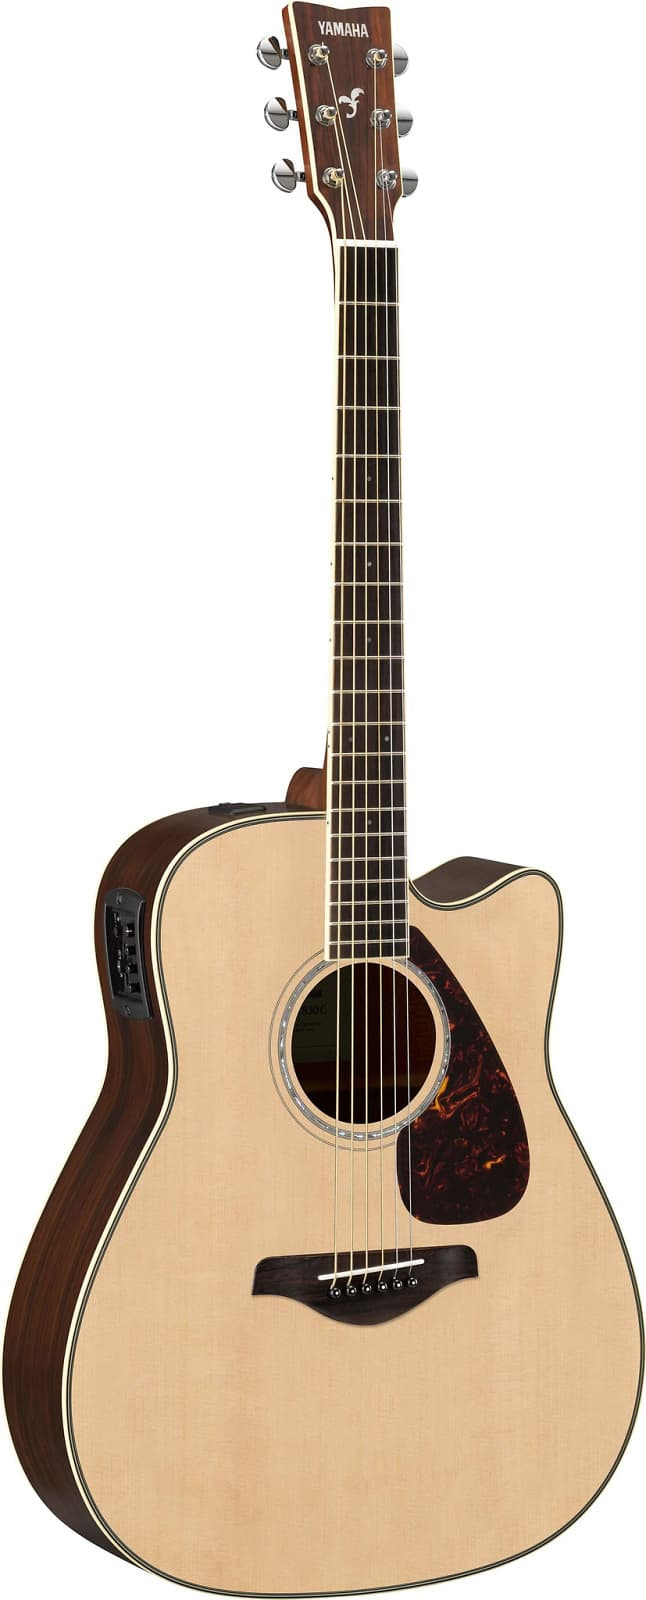 Yamaha fgx830c folk acoustic electric guitar reverb for Yamaha fg830 specs